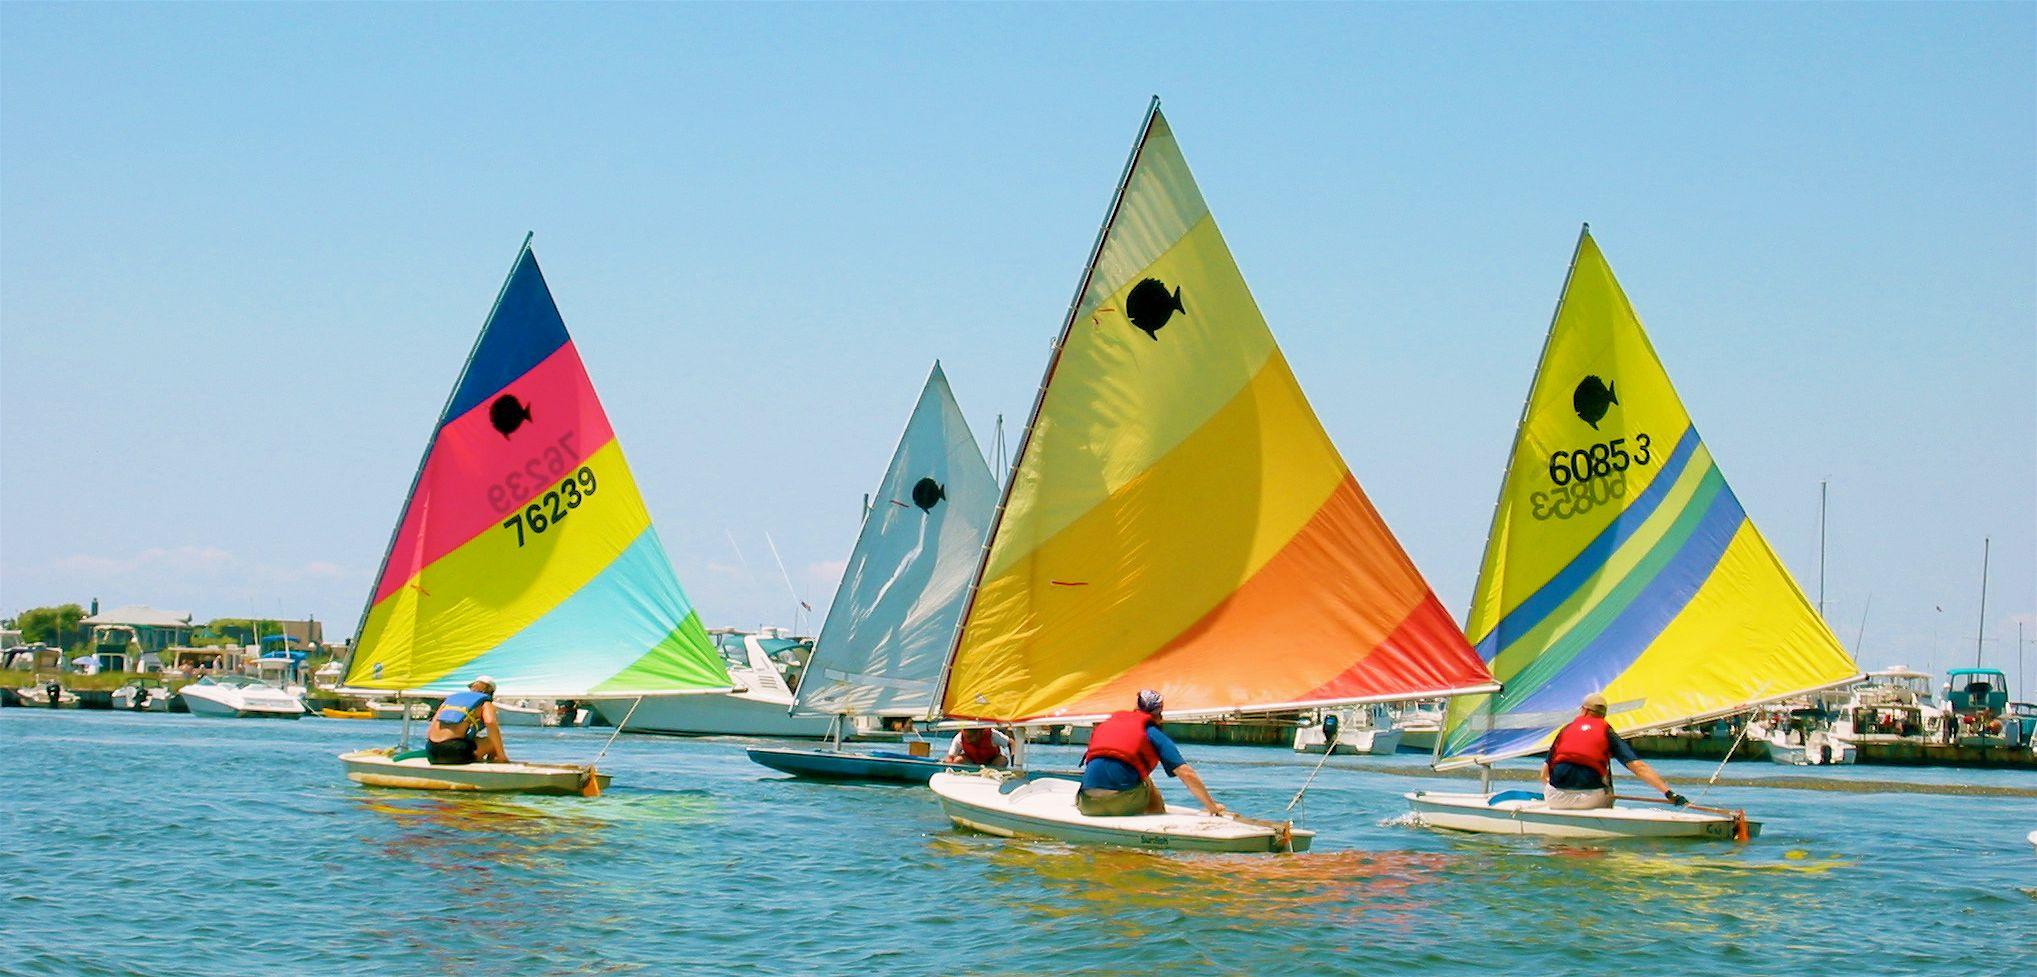 Fire Island Sailing Alliance Bay Shore NY Meetup